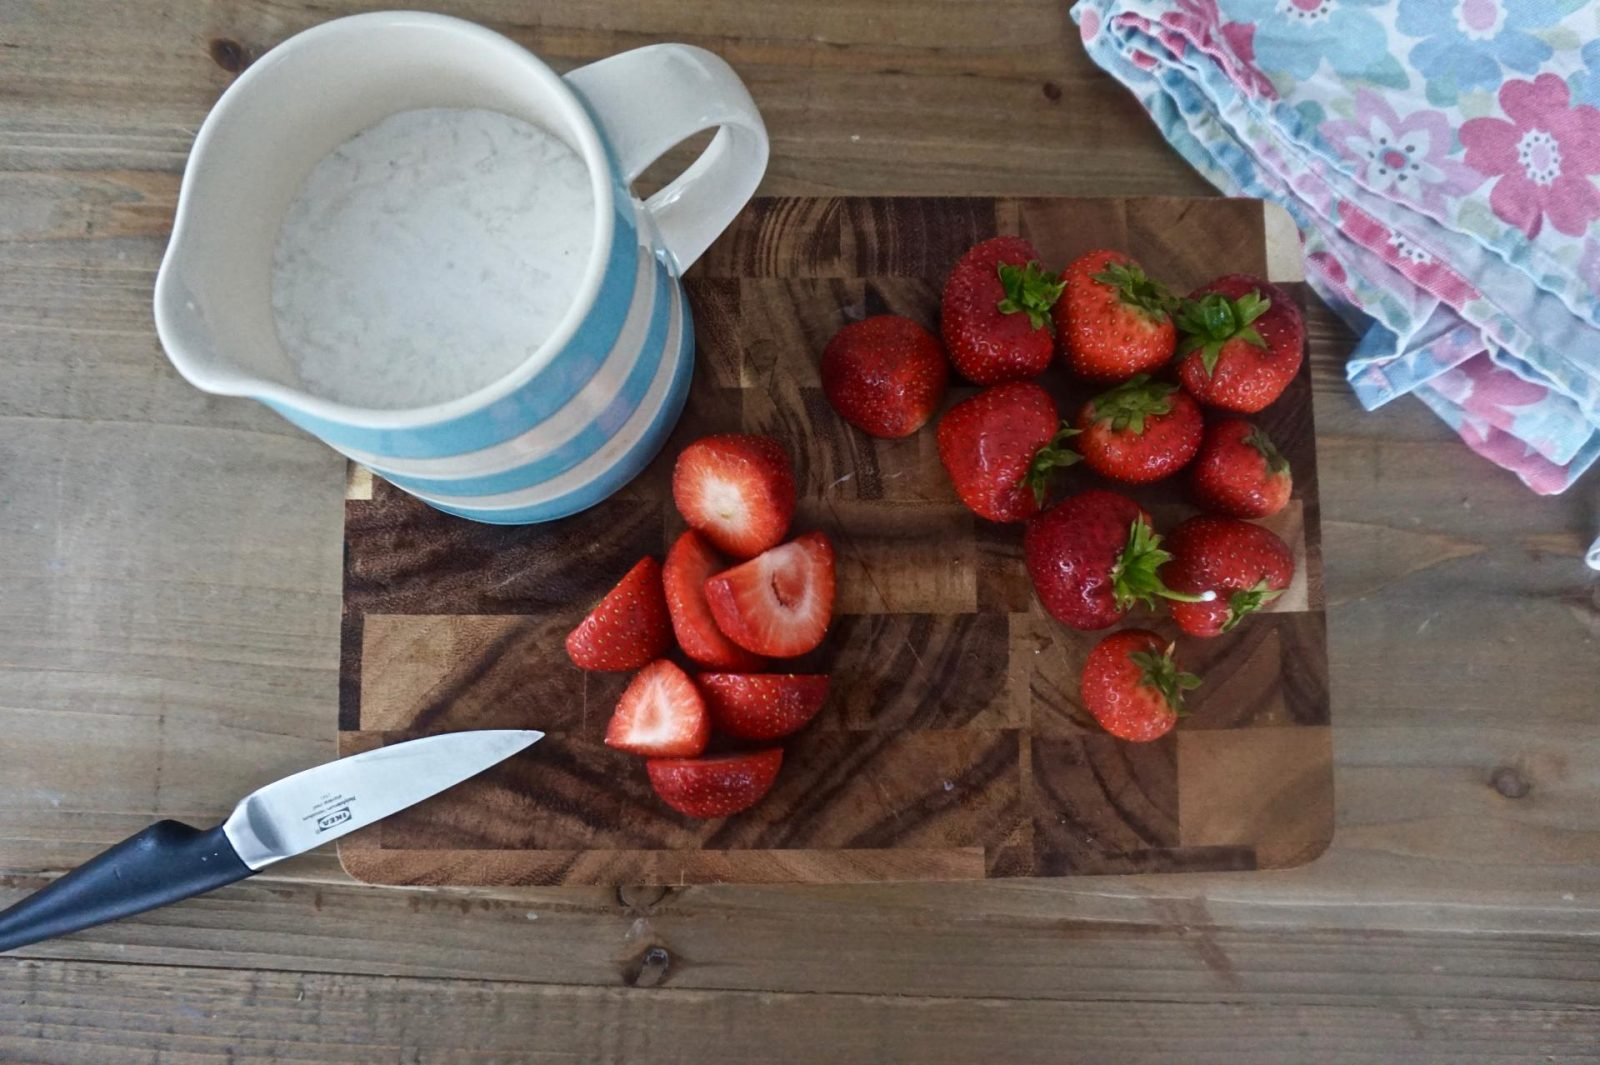 strawberries and cream pop